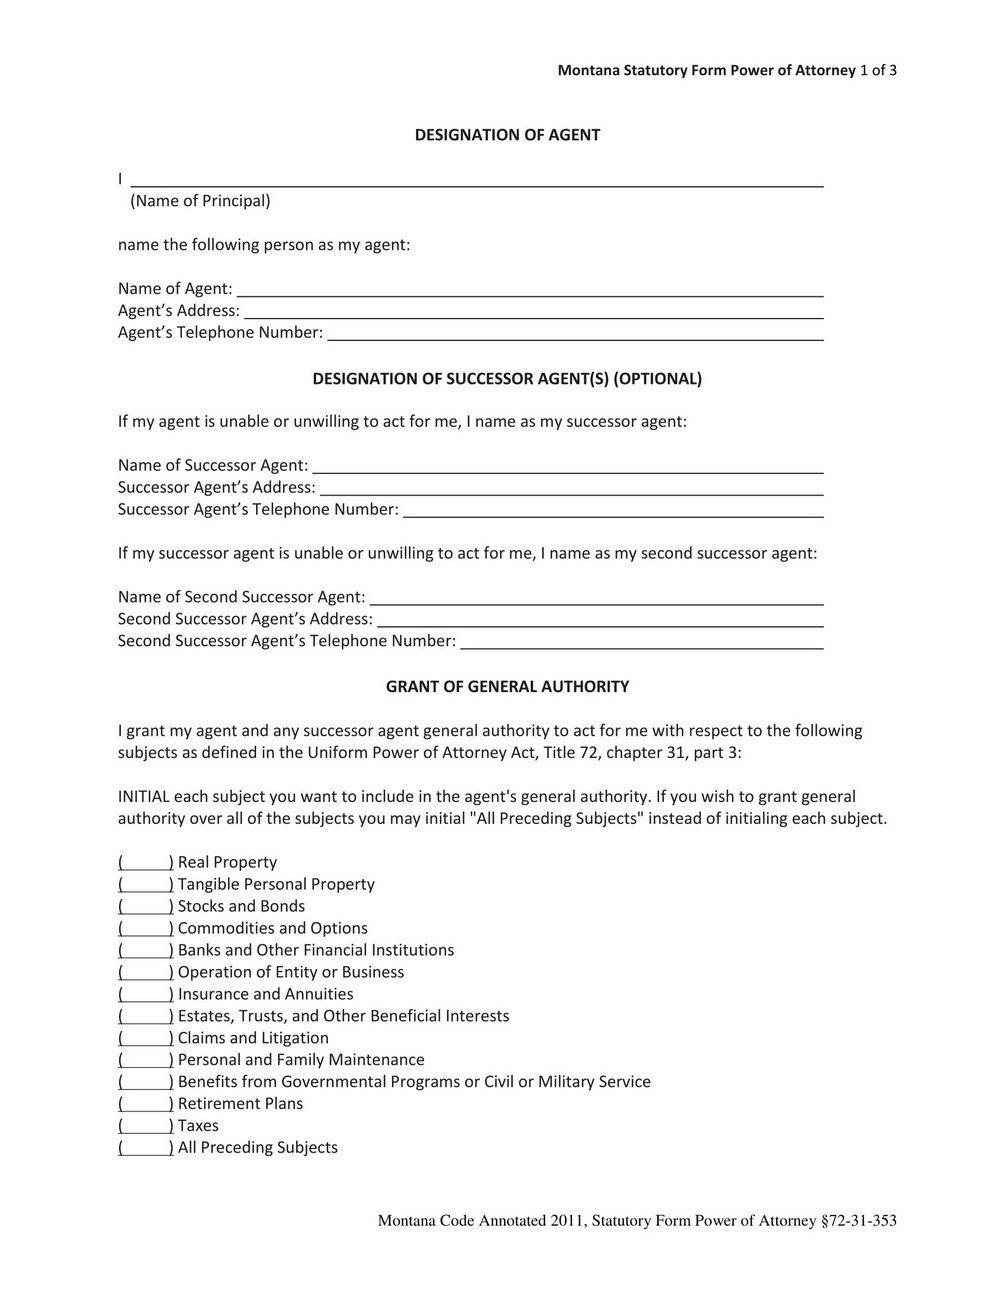 Blank Dd214 form Download Blank Dd214 form Download forms 4209